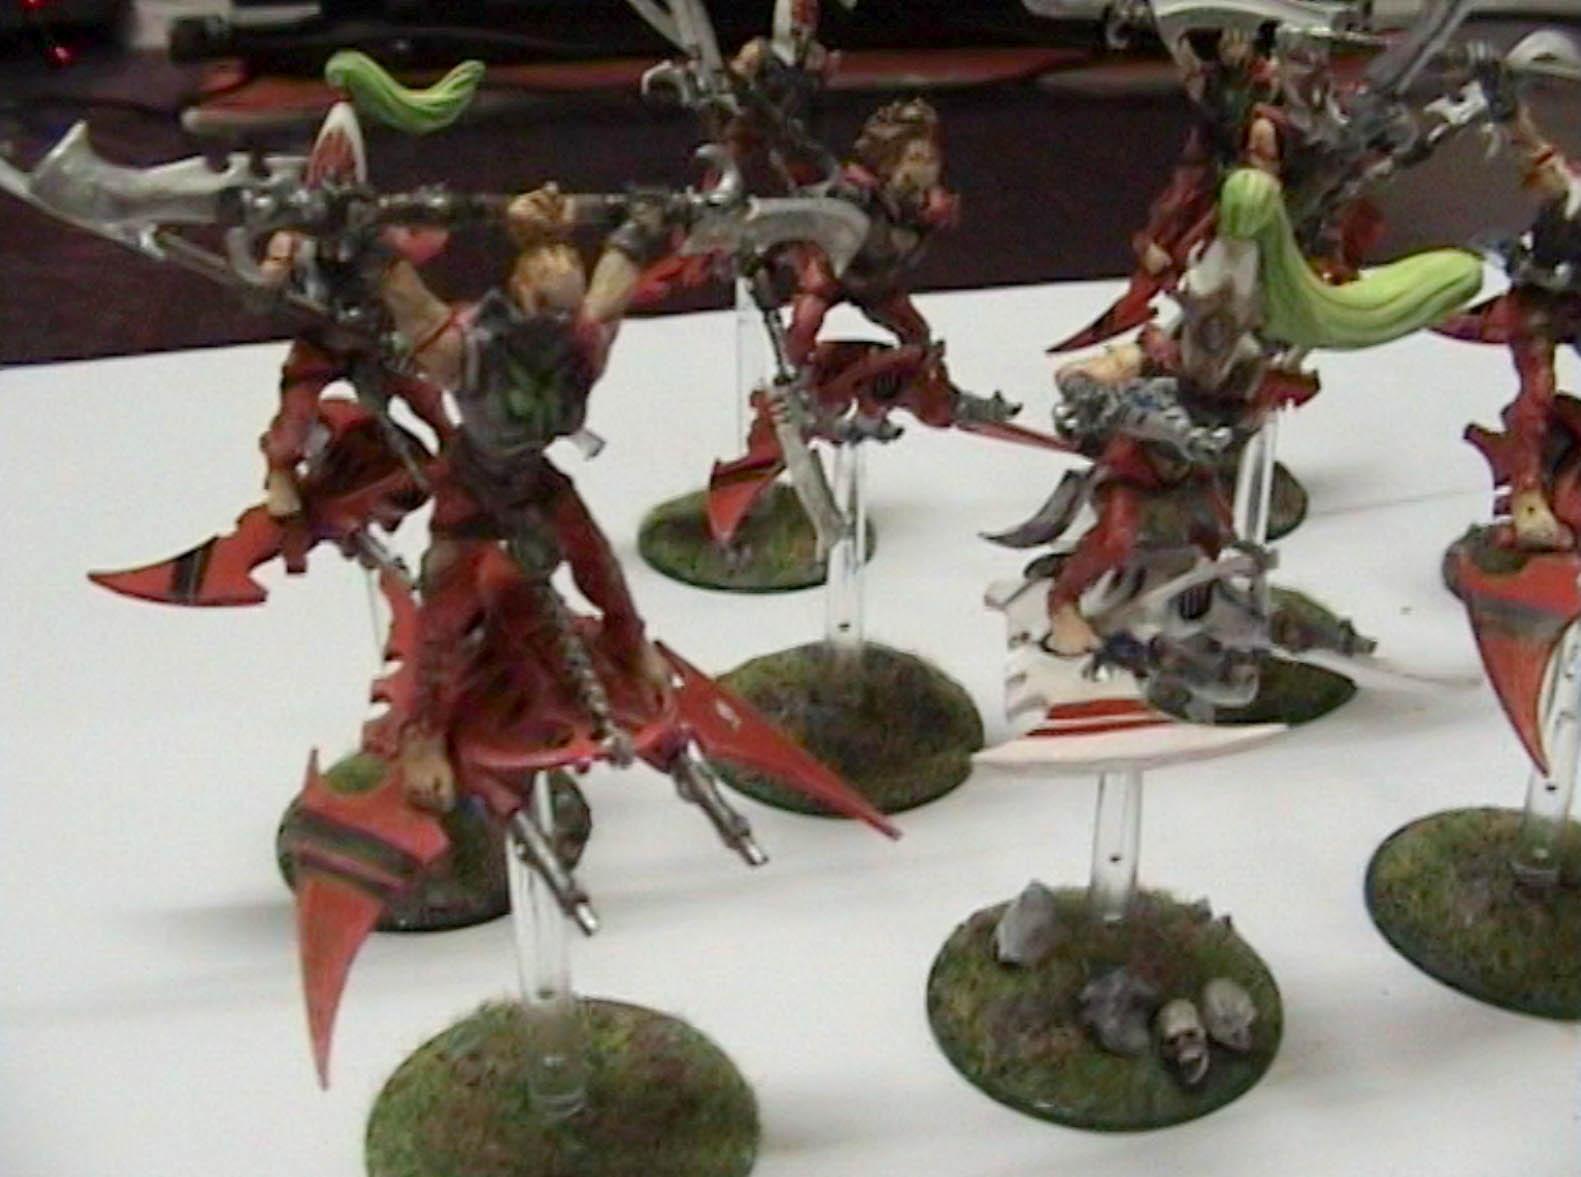 Conversion, Dark Eldar, Eldar, Farseer, Hellions, Saim-hann, Seer Council, Warlock